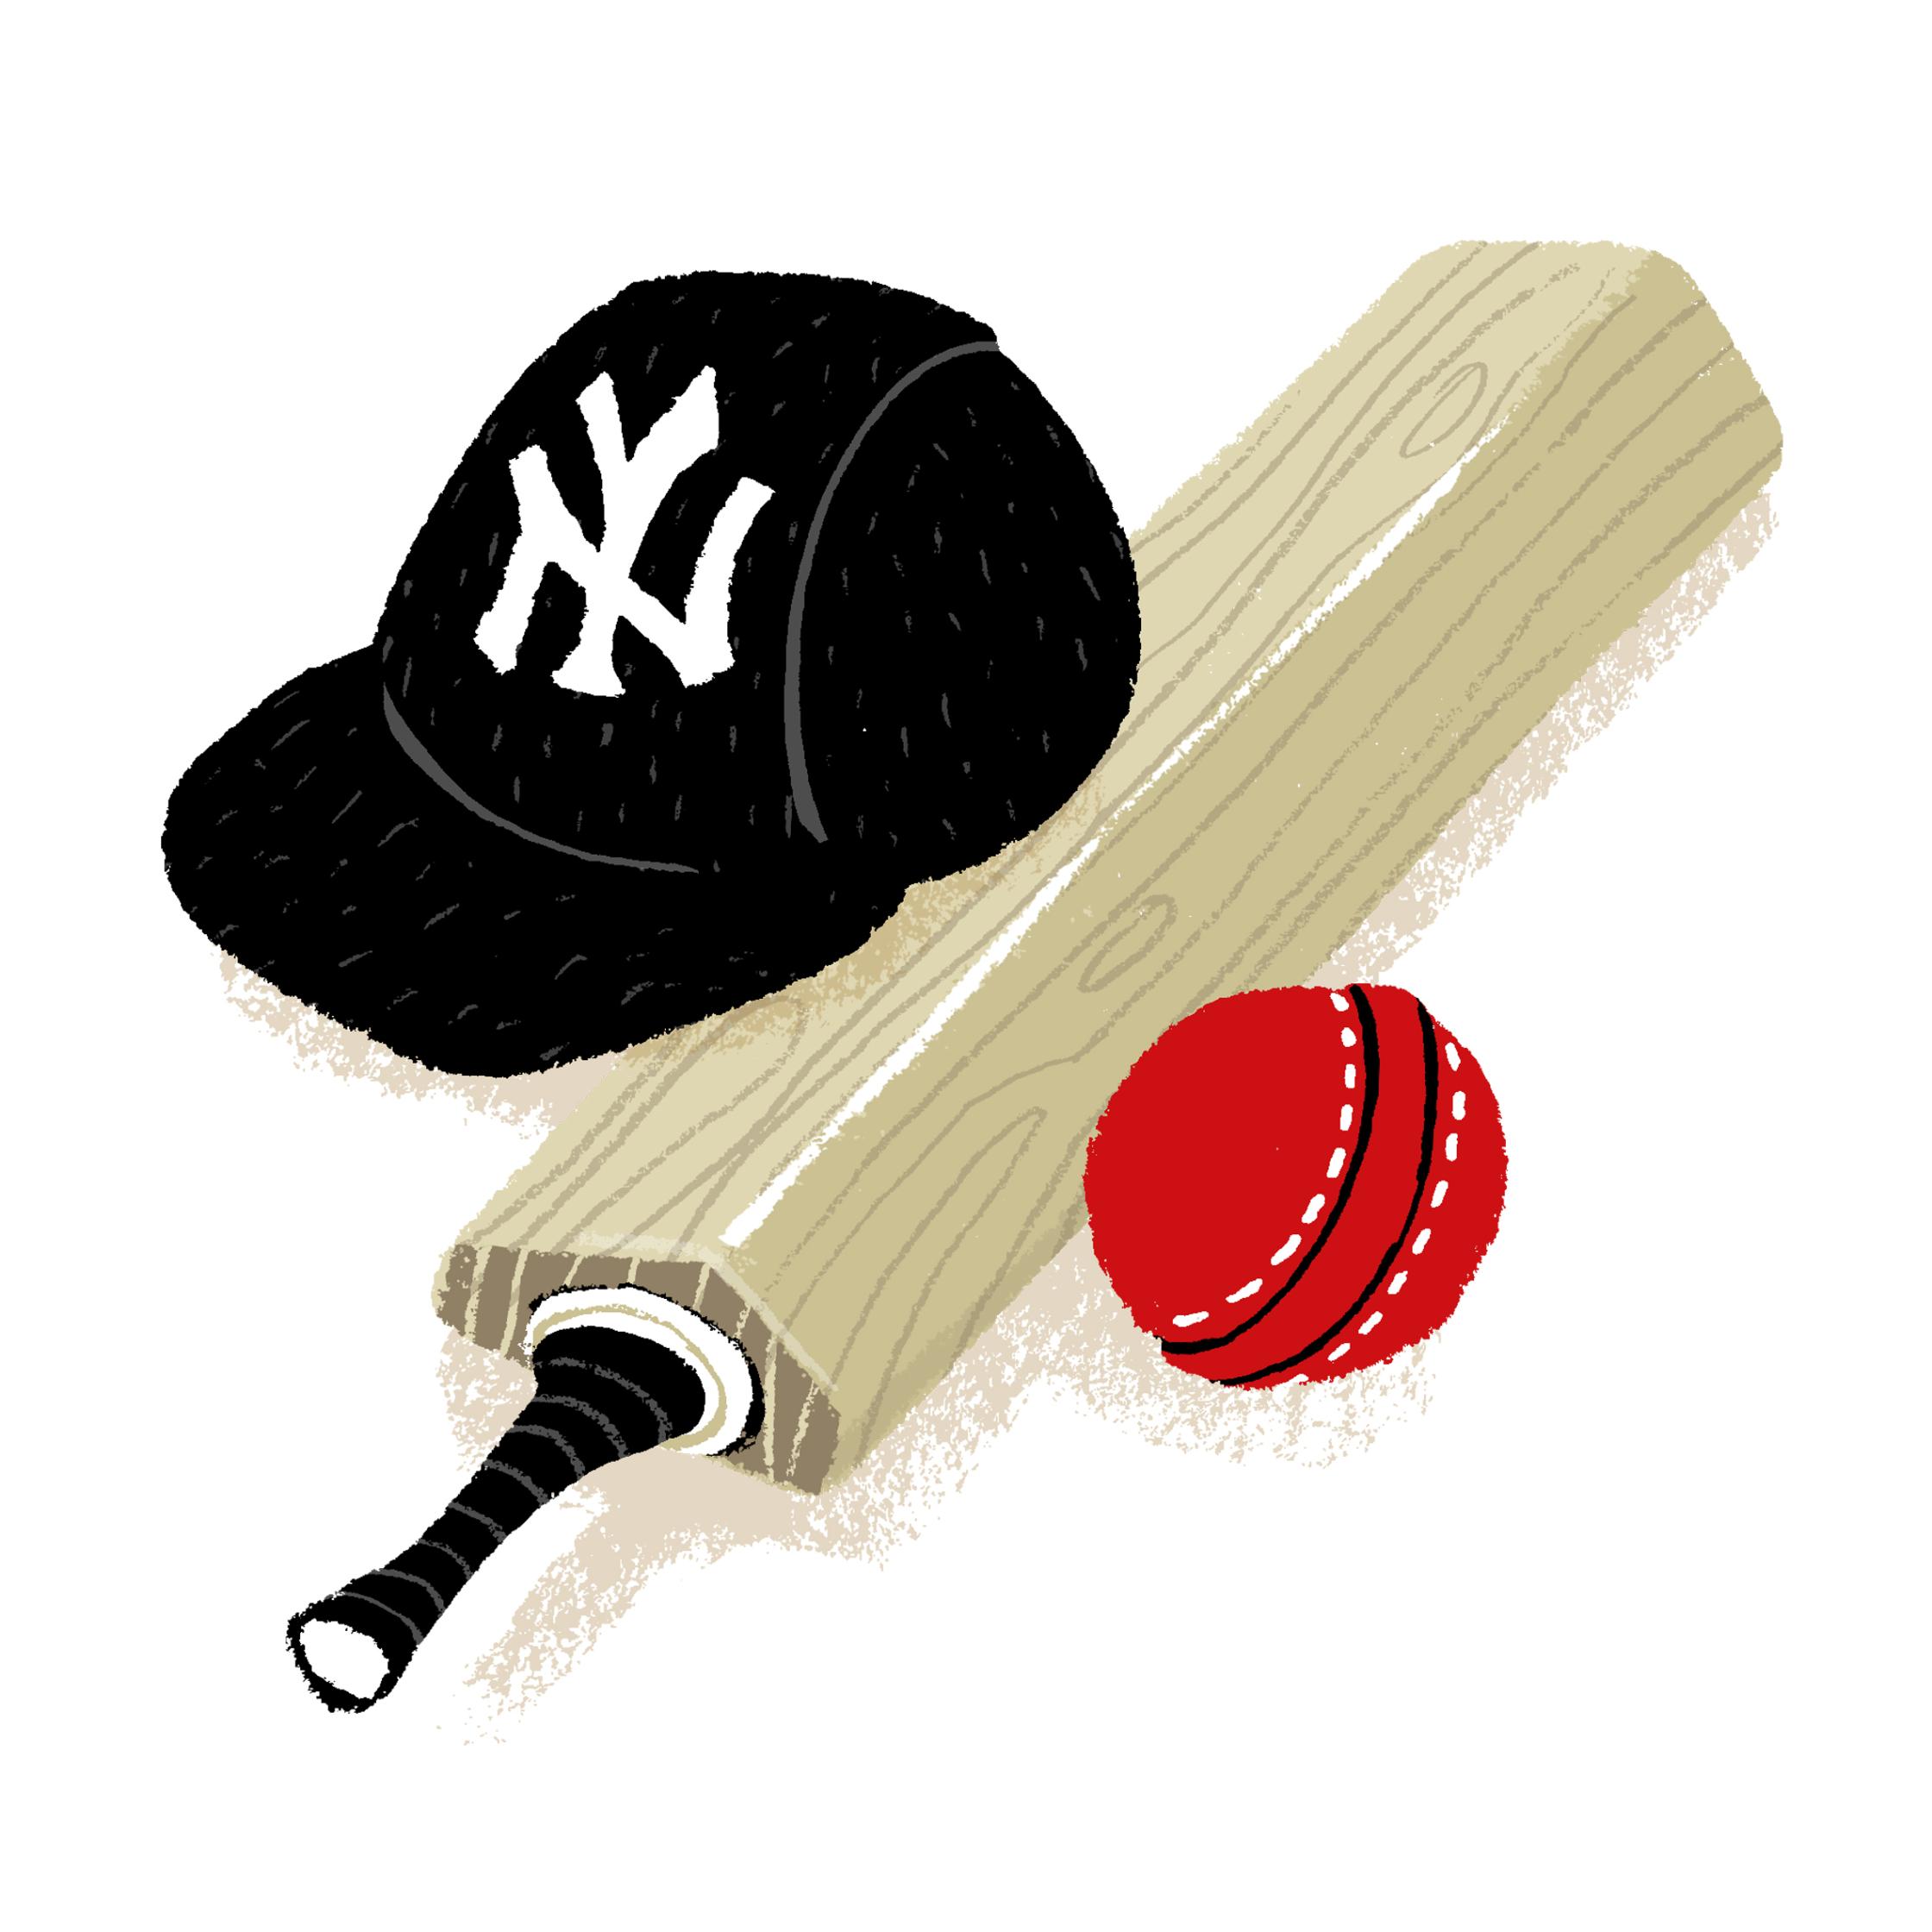 The_Economist_American_Cricket.jpg